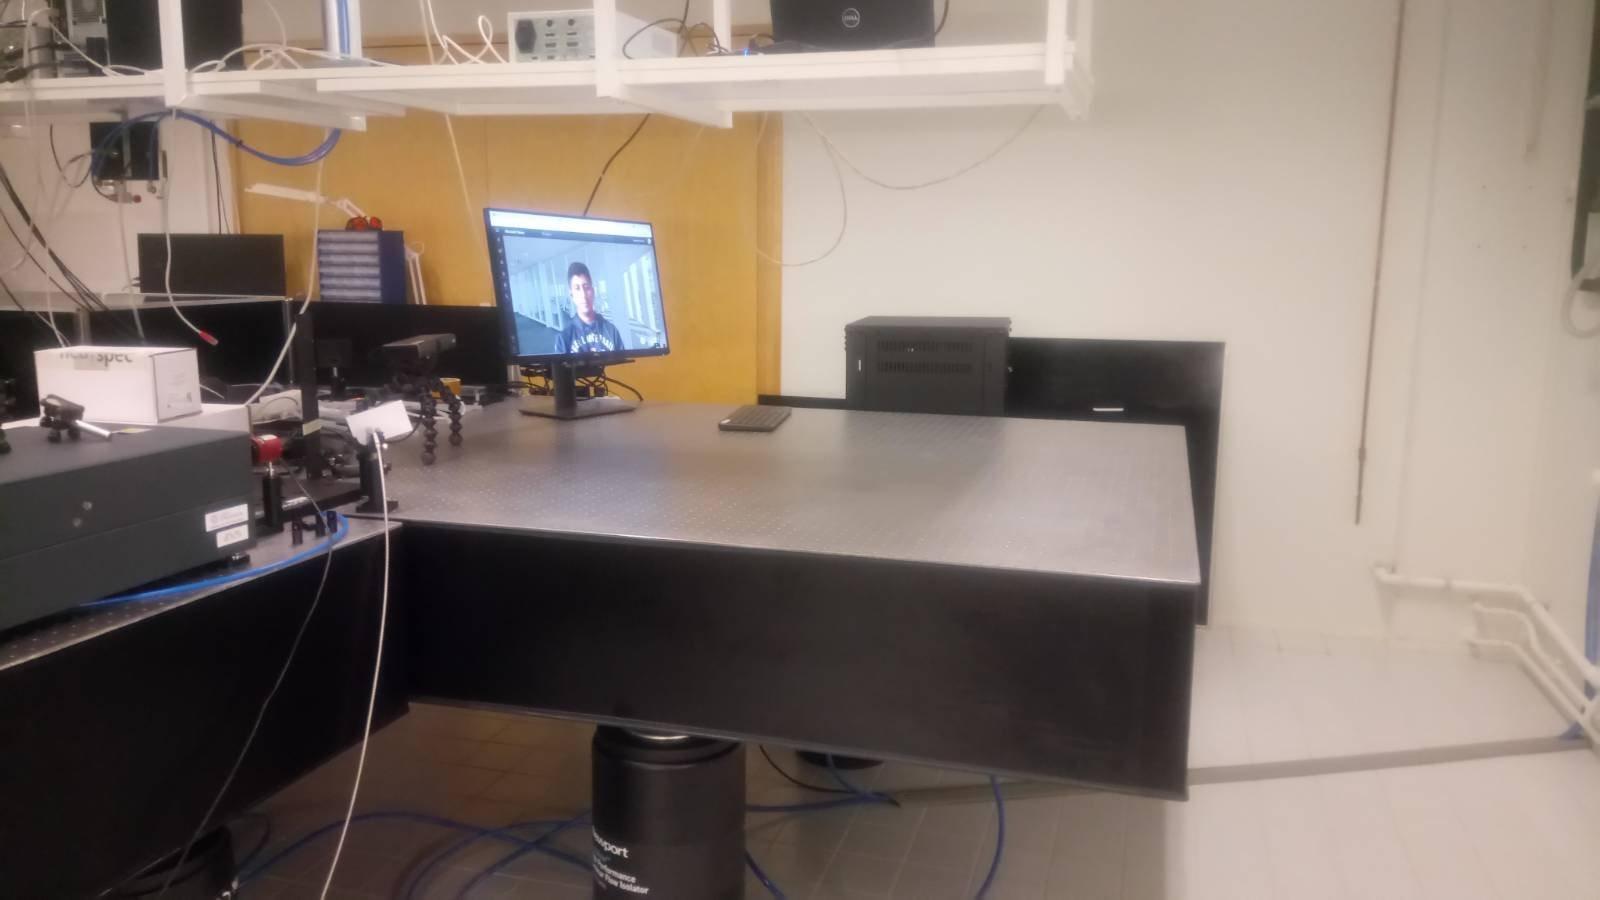 Remote installation of SNOM instrument has begun in Jyväskylä